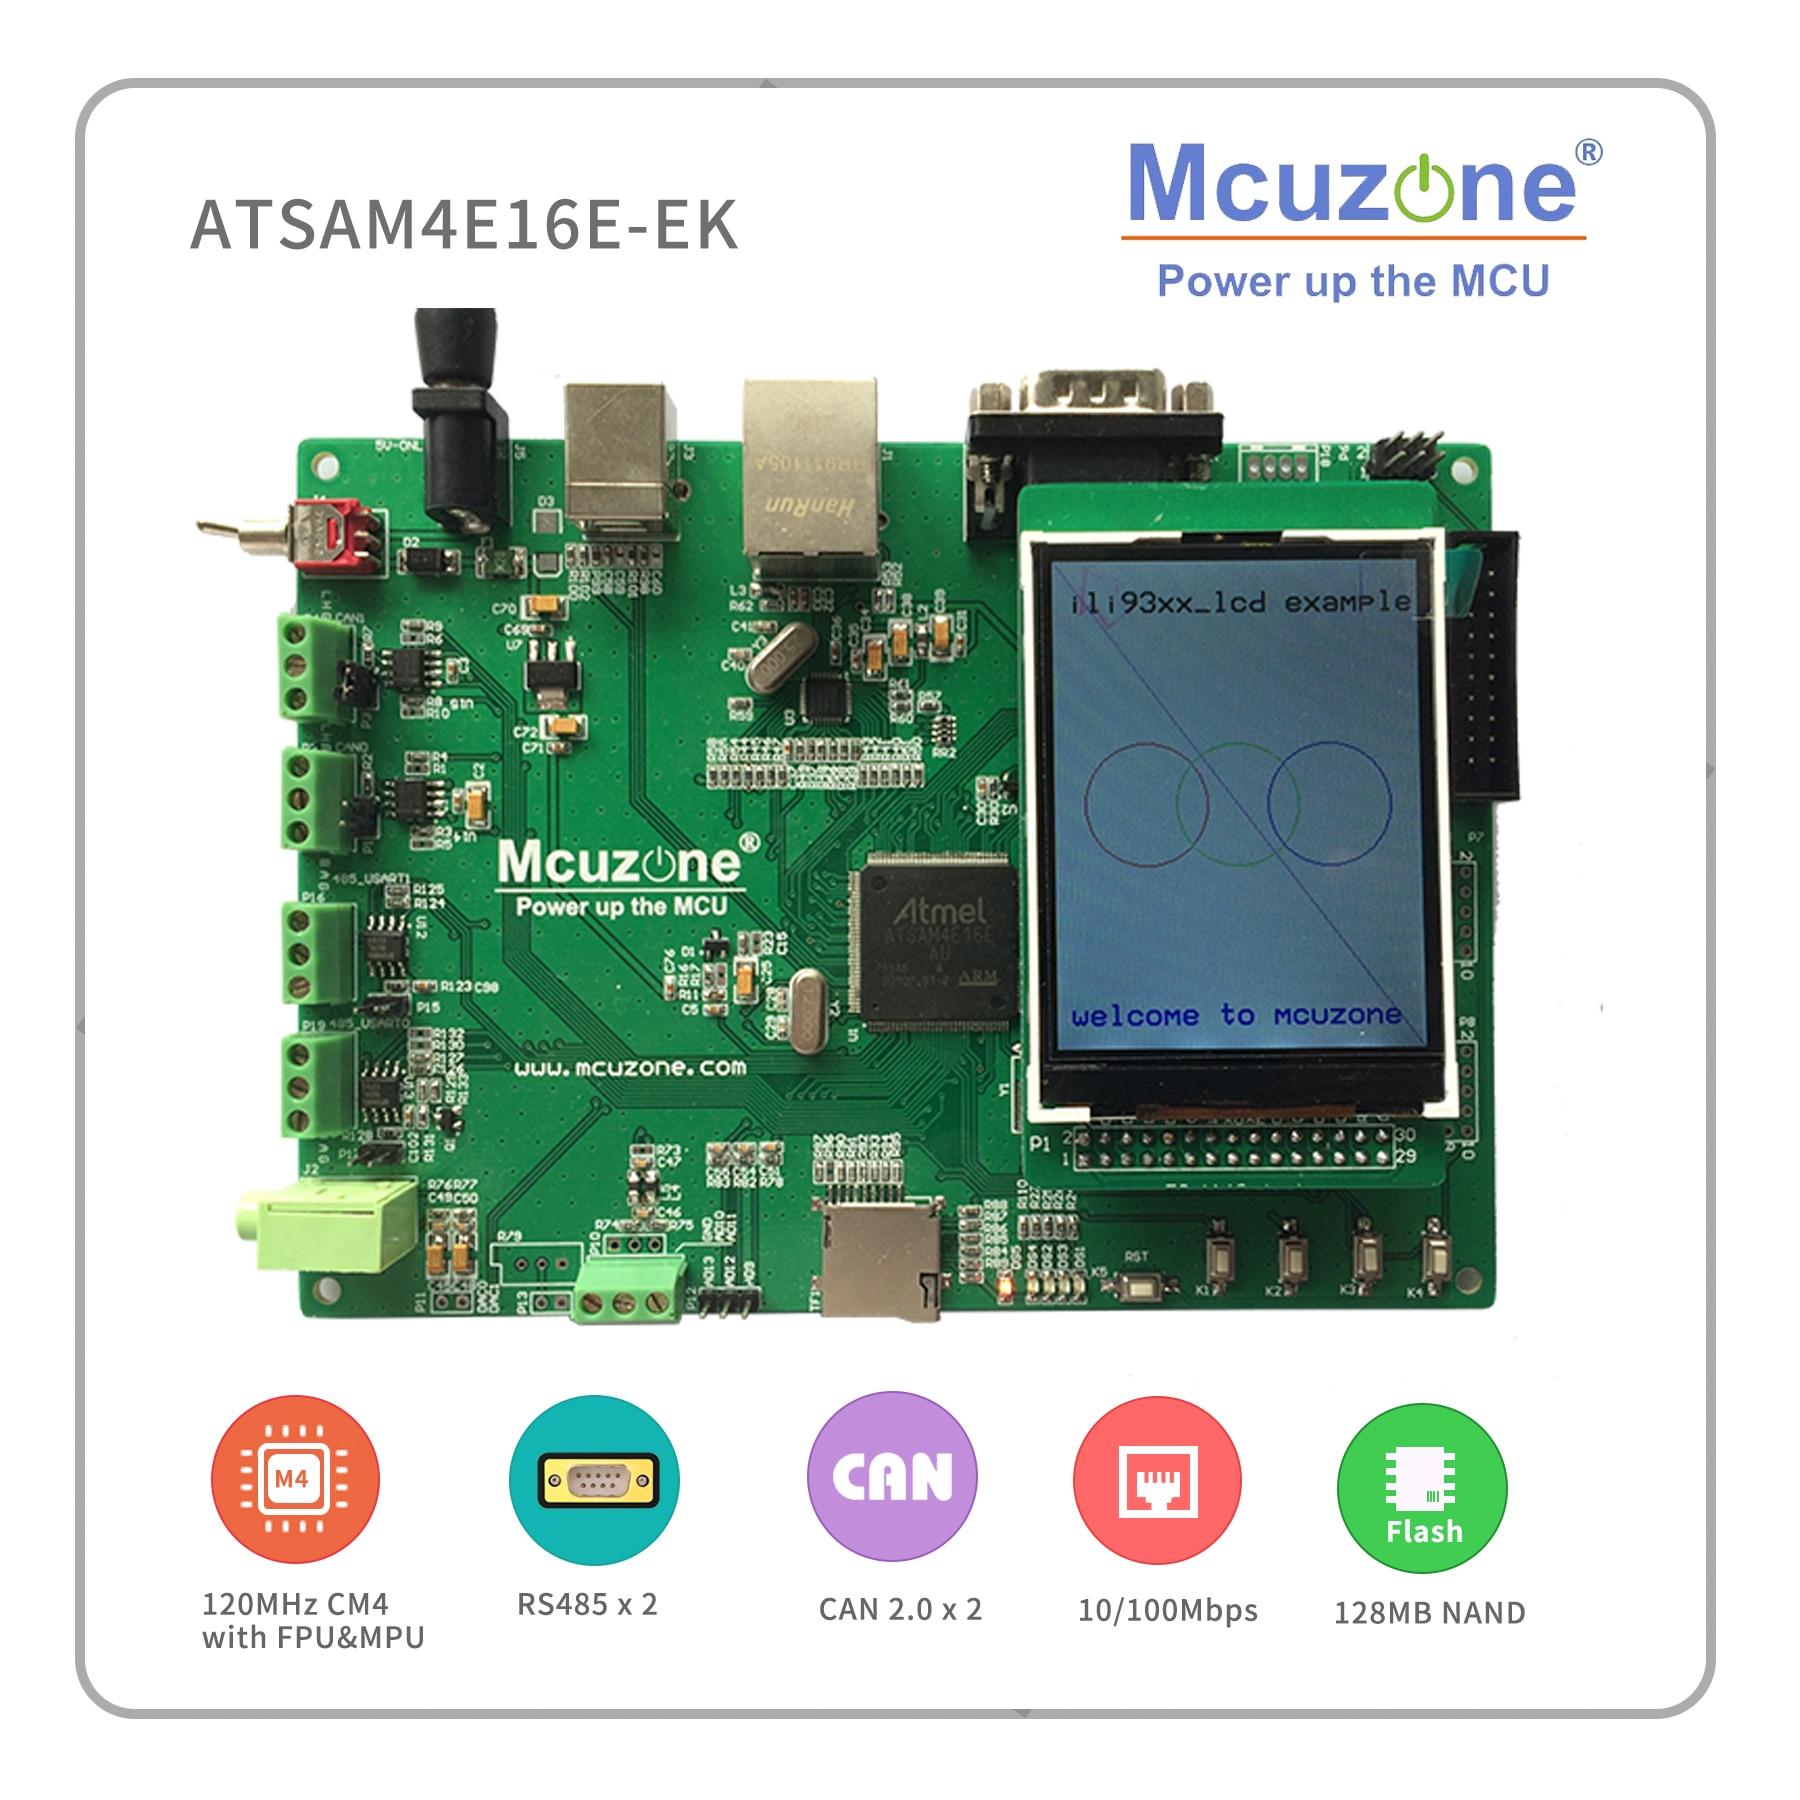 ATSAM4E16E-EK ATSAM4 Evaluation Kit,120MHz Cortex-M4,Ethernet,USB,UART,CAN,485,TF,NAND,RTC,2.8